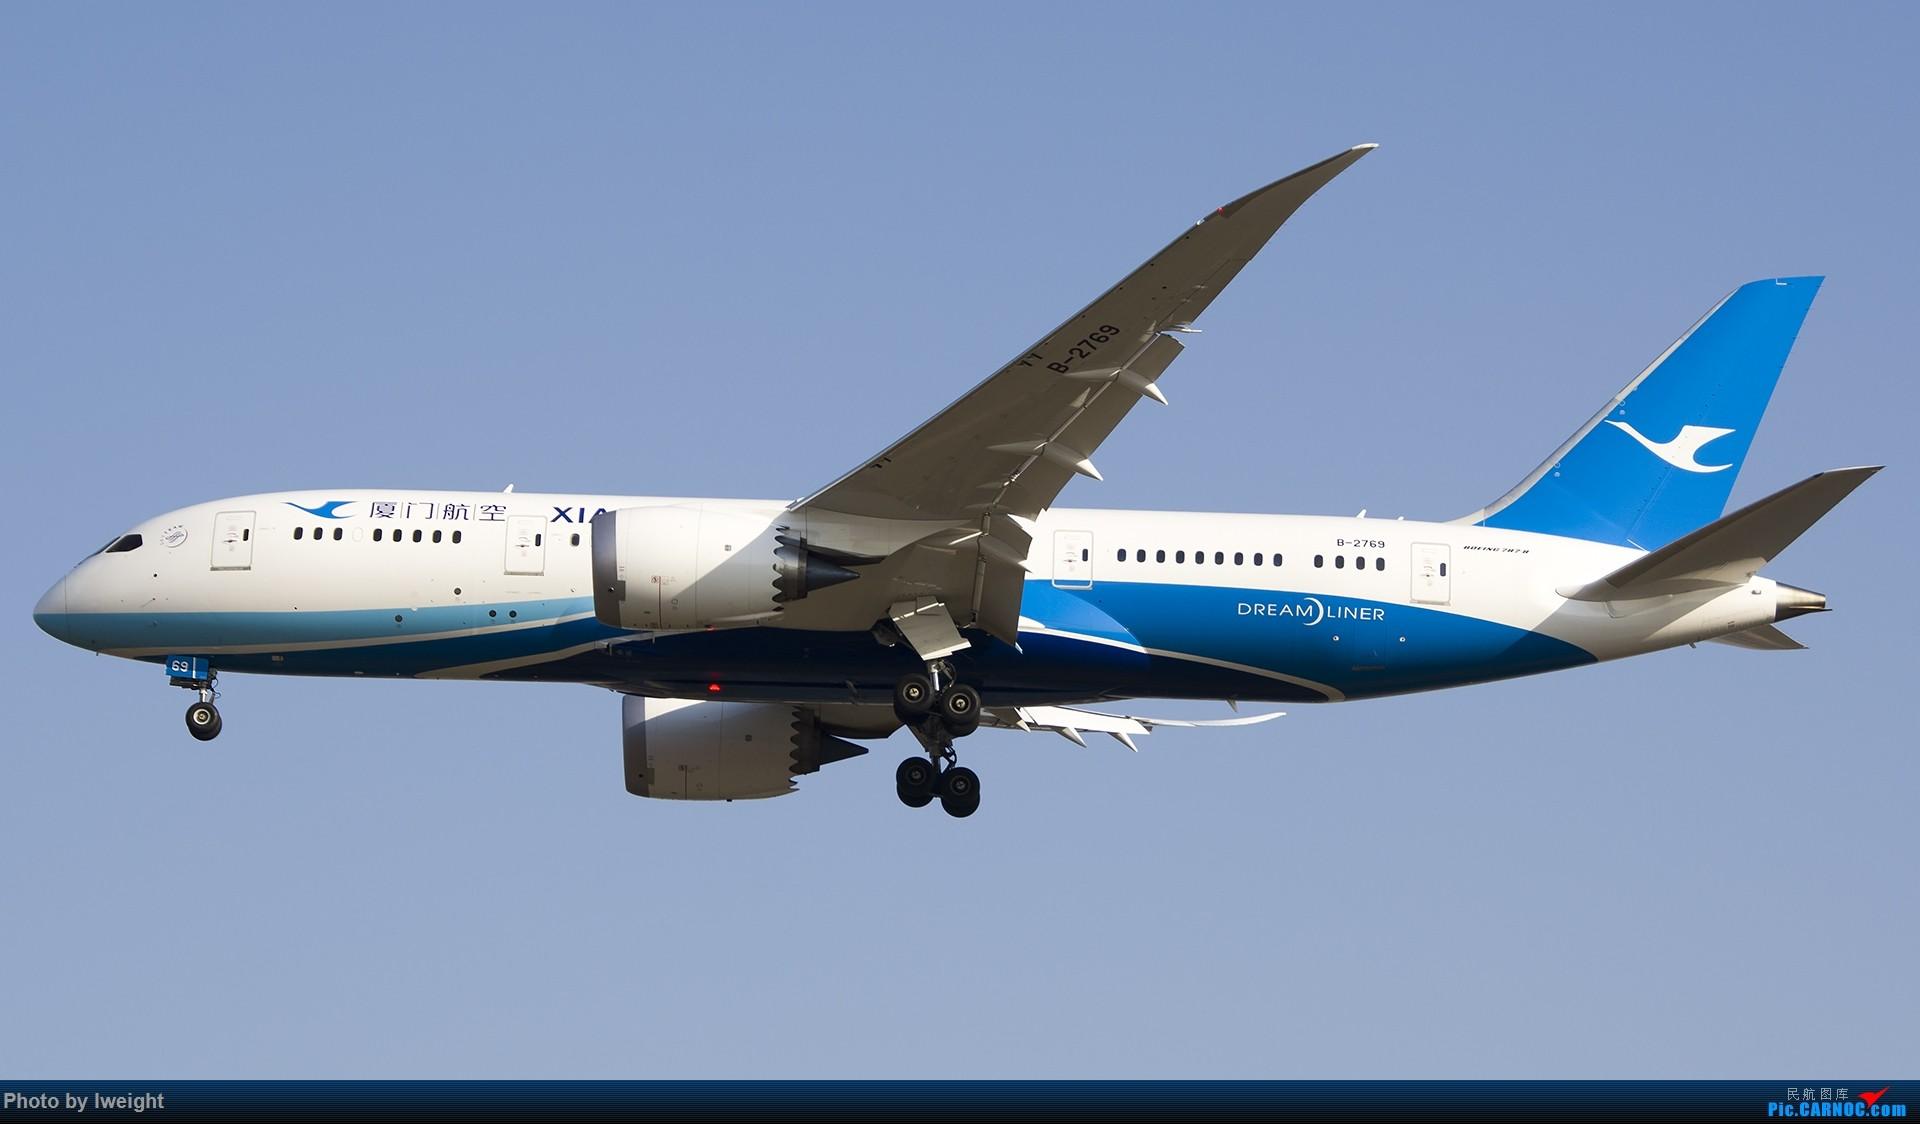 Re:[原创]2014-12-02 ZBAA随拍 BOEING 787-8 B-2769 中国北京首都国际机场